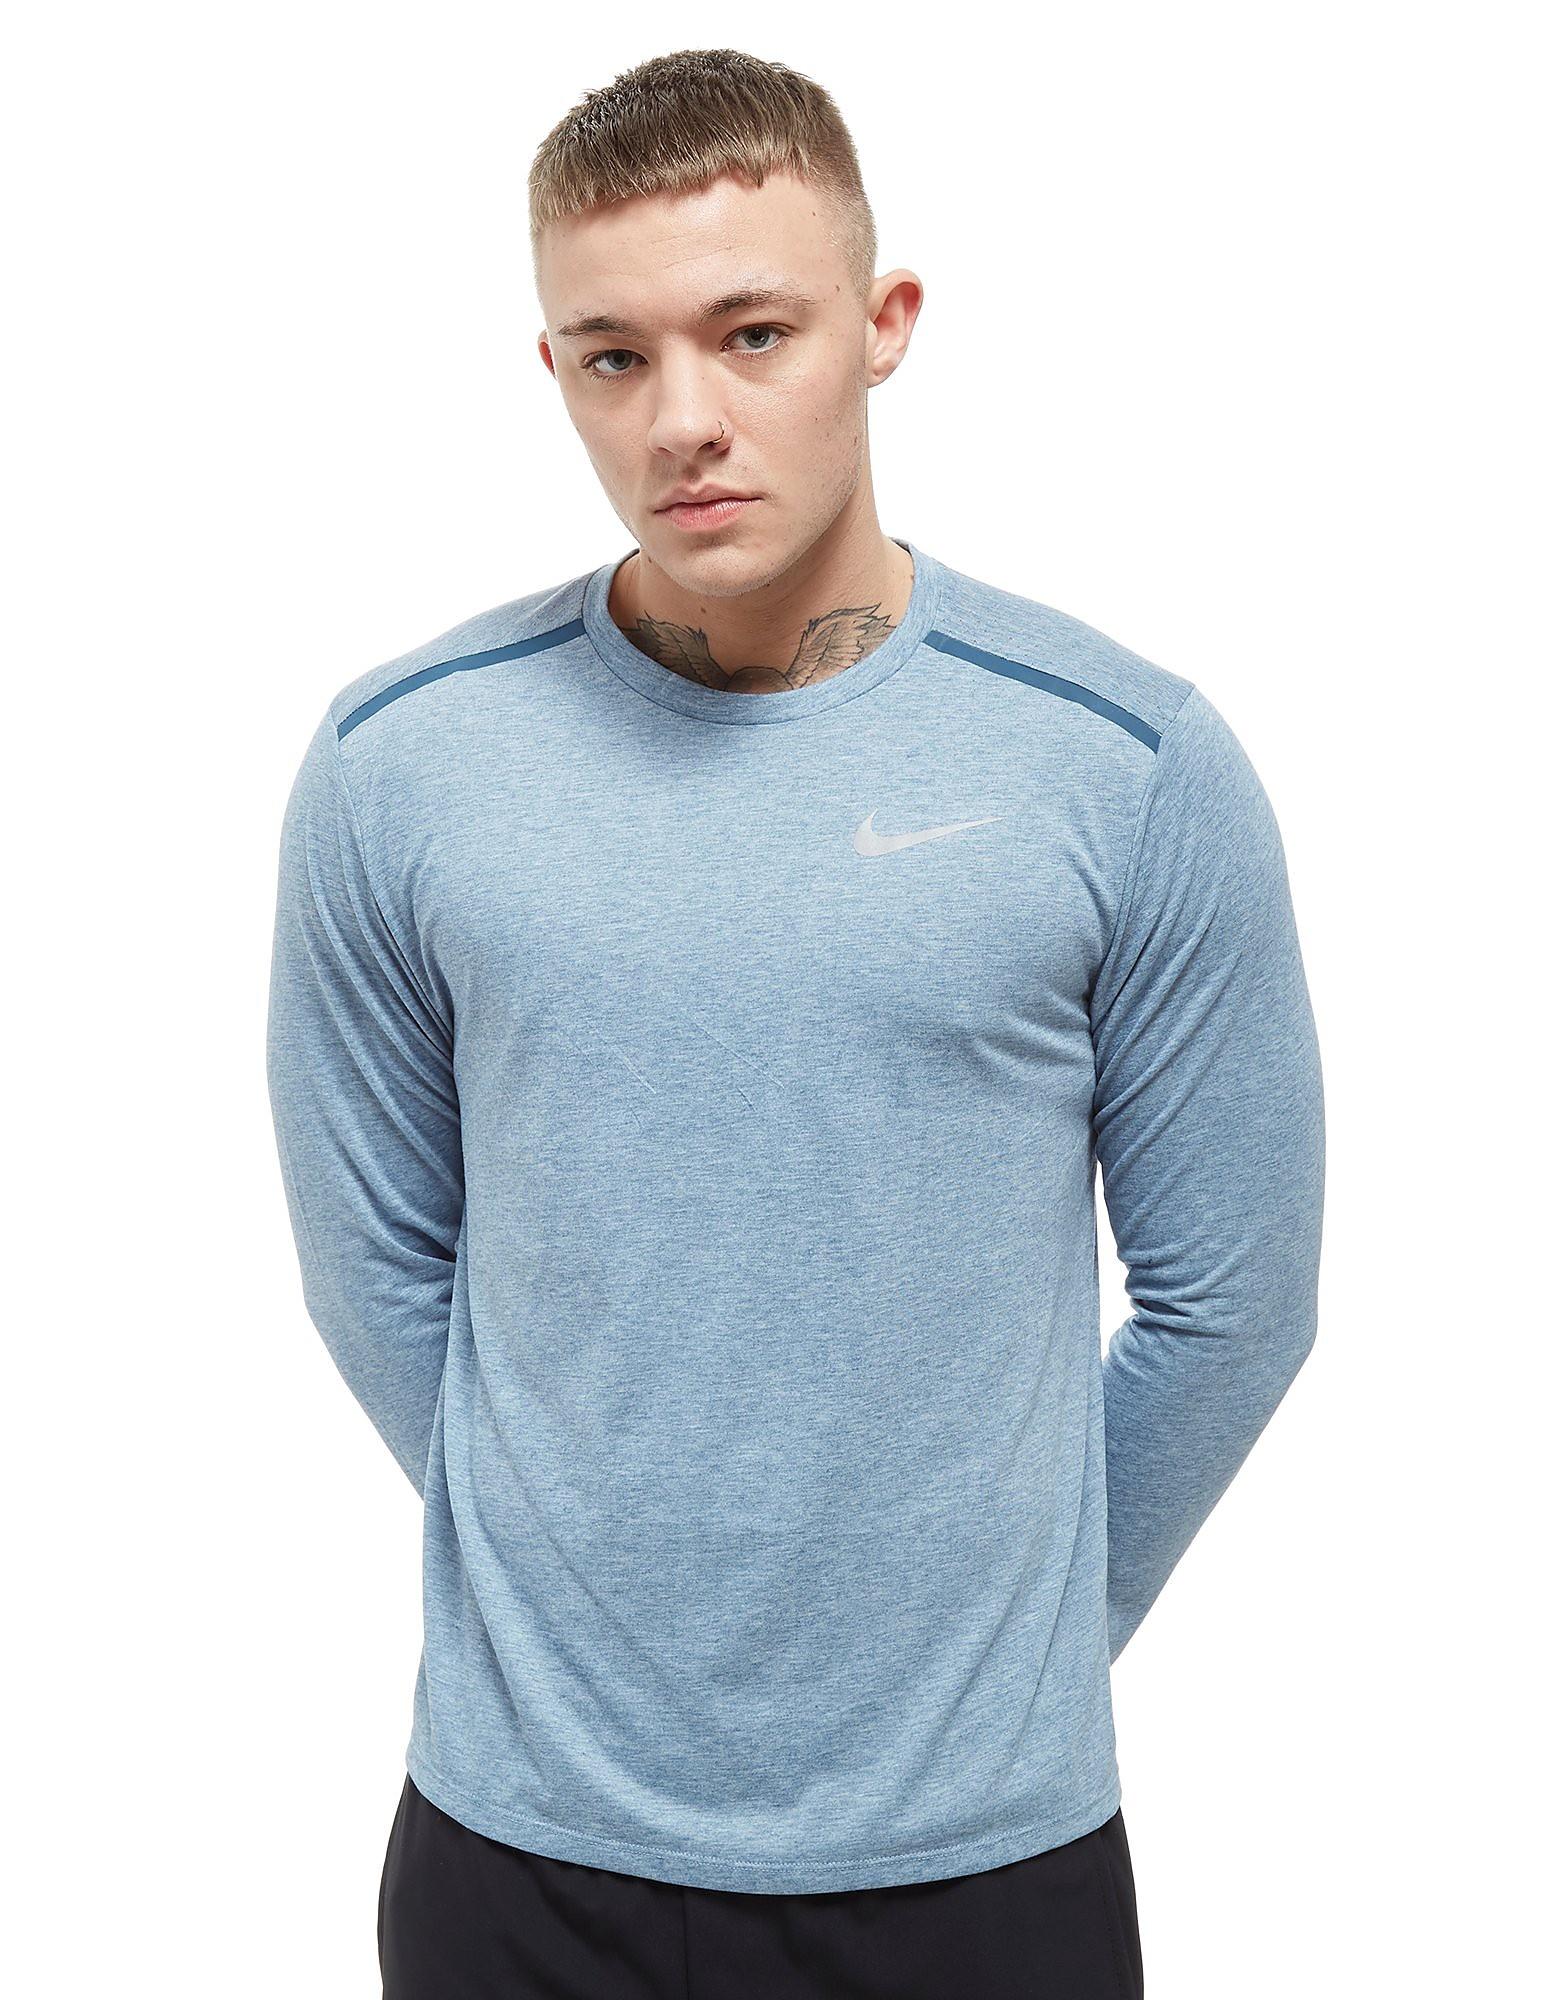 Nike Breathe Tailwind Long Sleeve Top